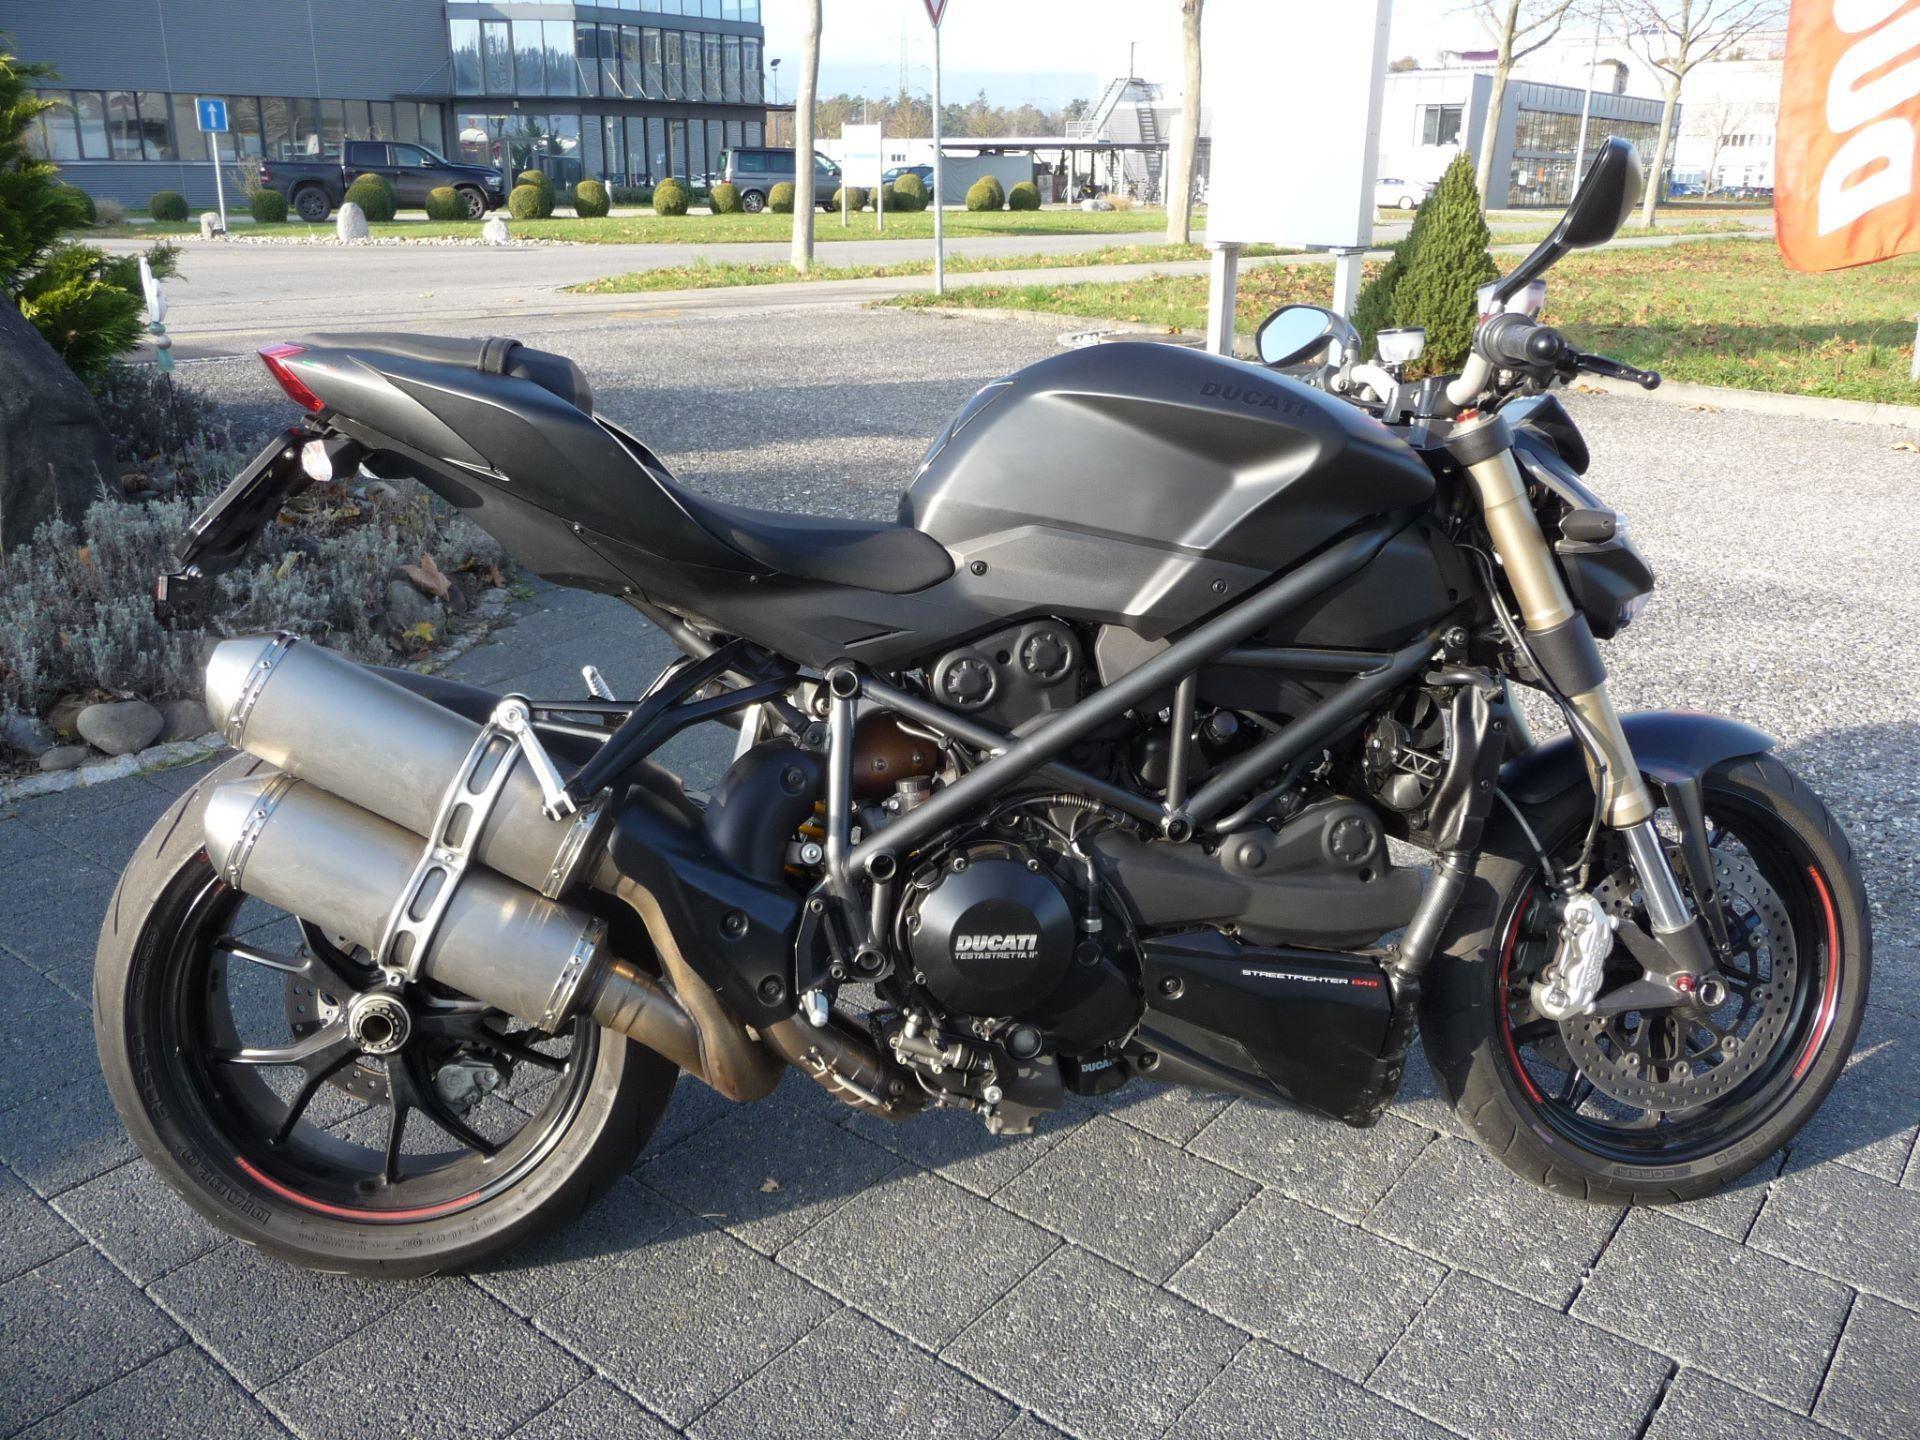 motorrad occasion kaufen ducati 848 streetfighter dark moto kaufmann lyss lyss id 7825141 zeile 2. Black Bedroom Furniture Sets. Home Design Ideas